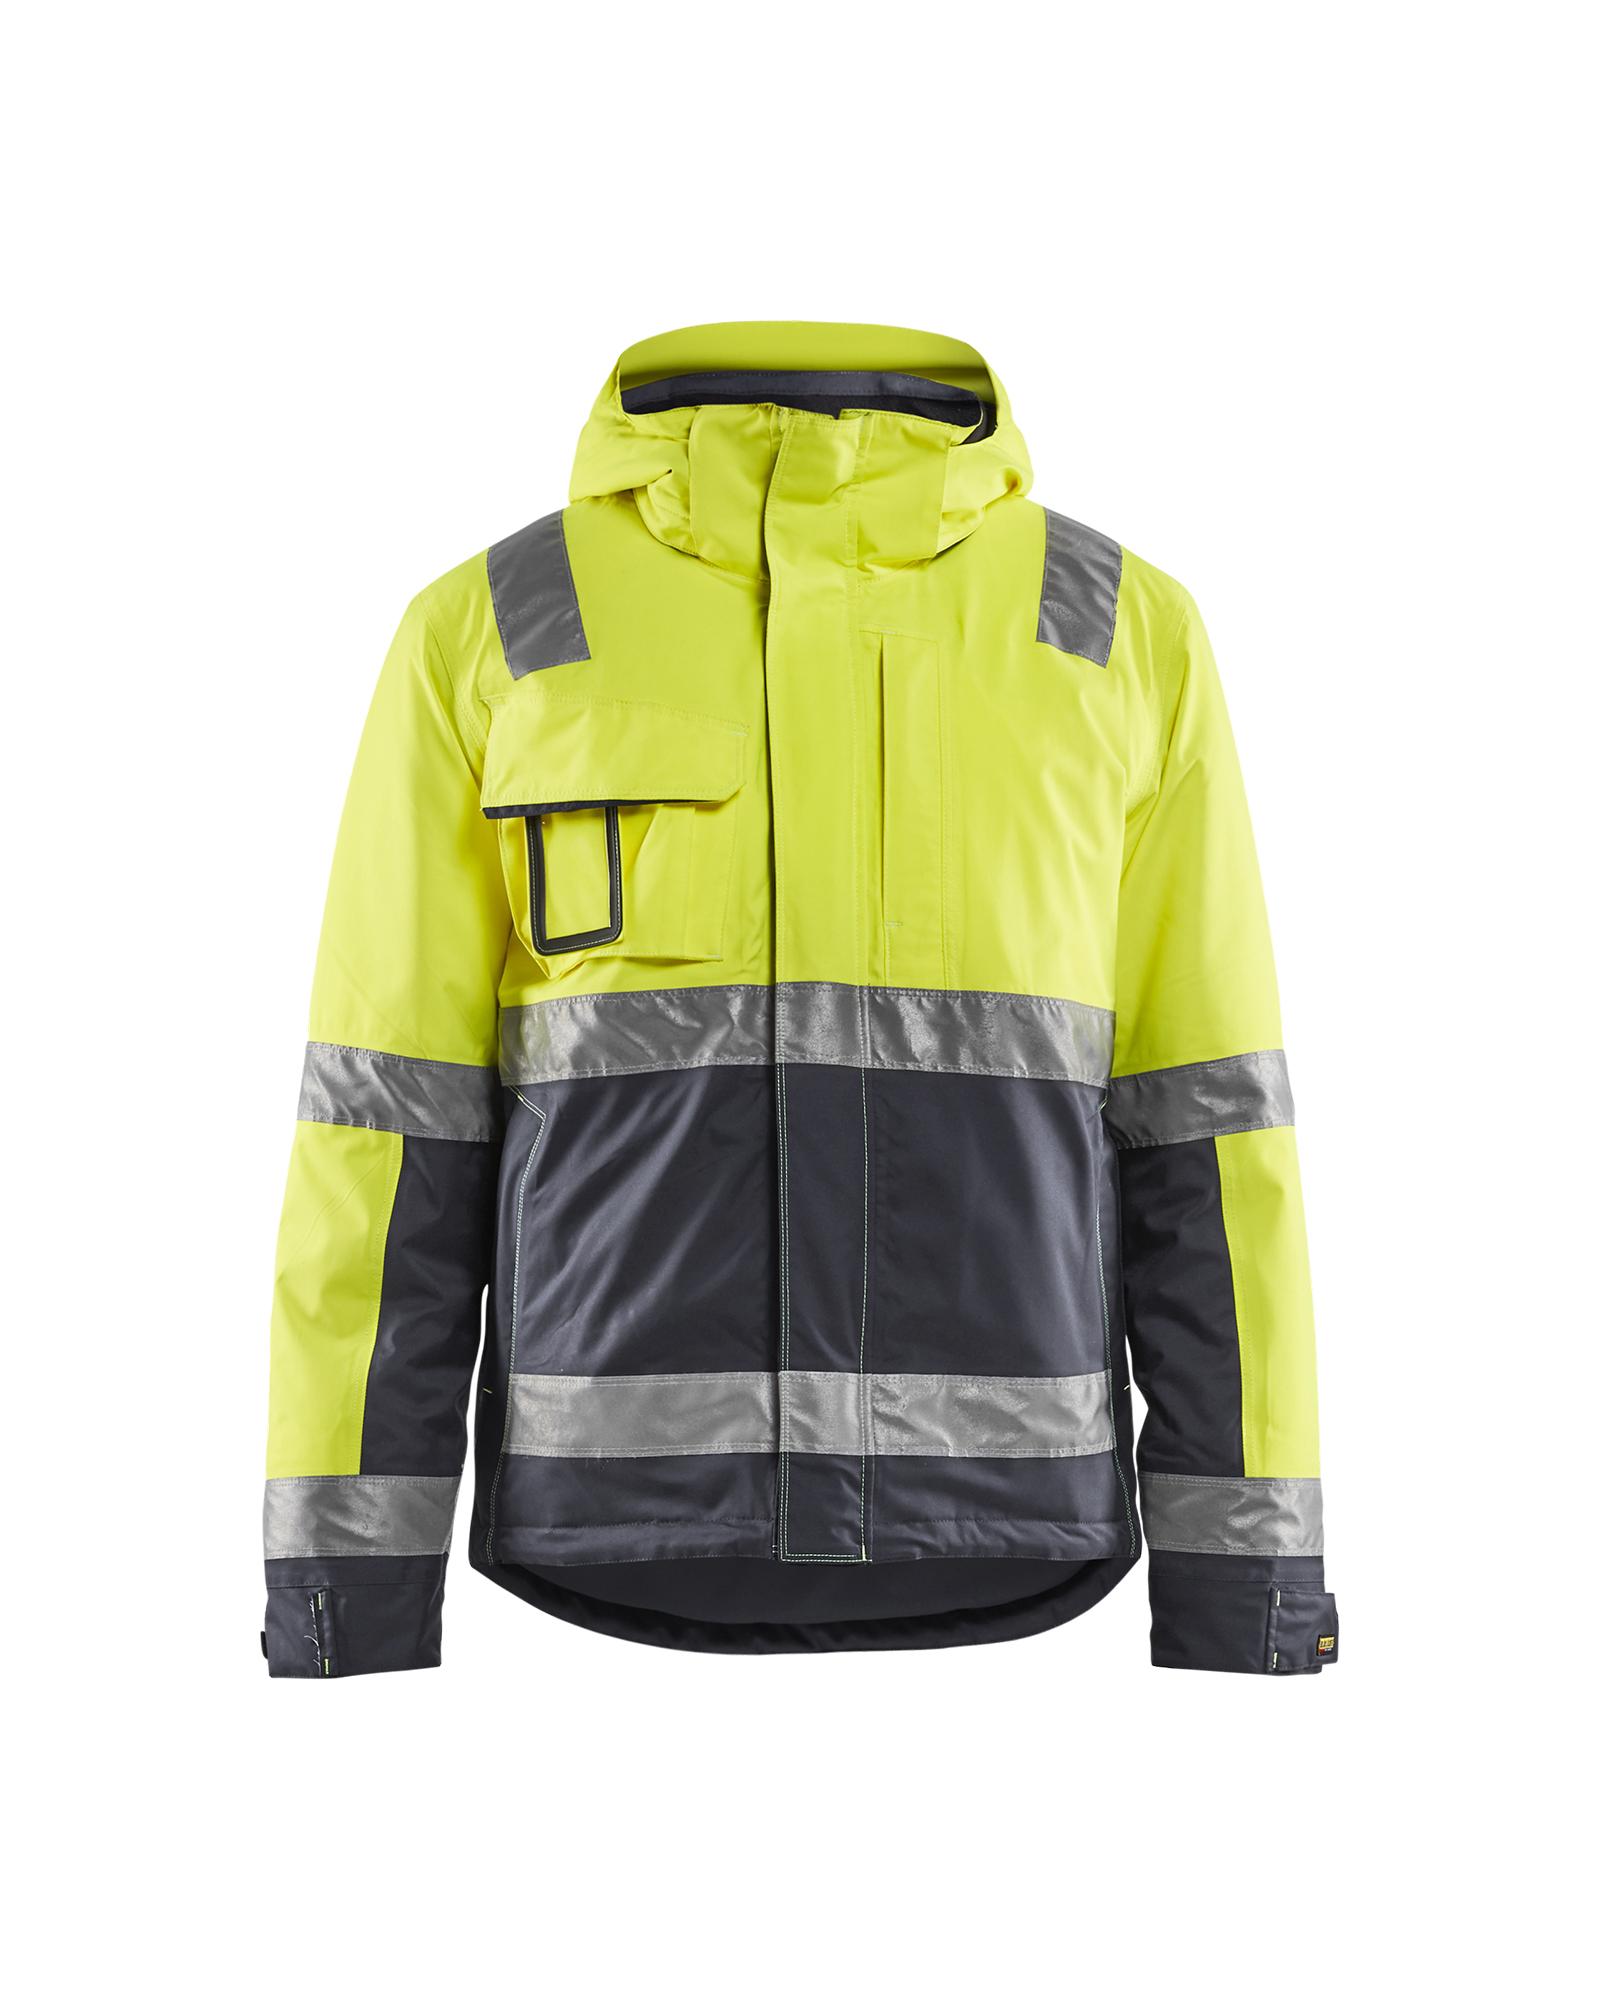 Blaklader Workwear High Vis Jacket Yellow//Navy Blue L